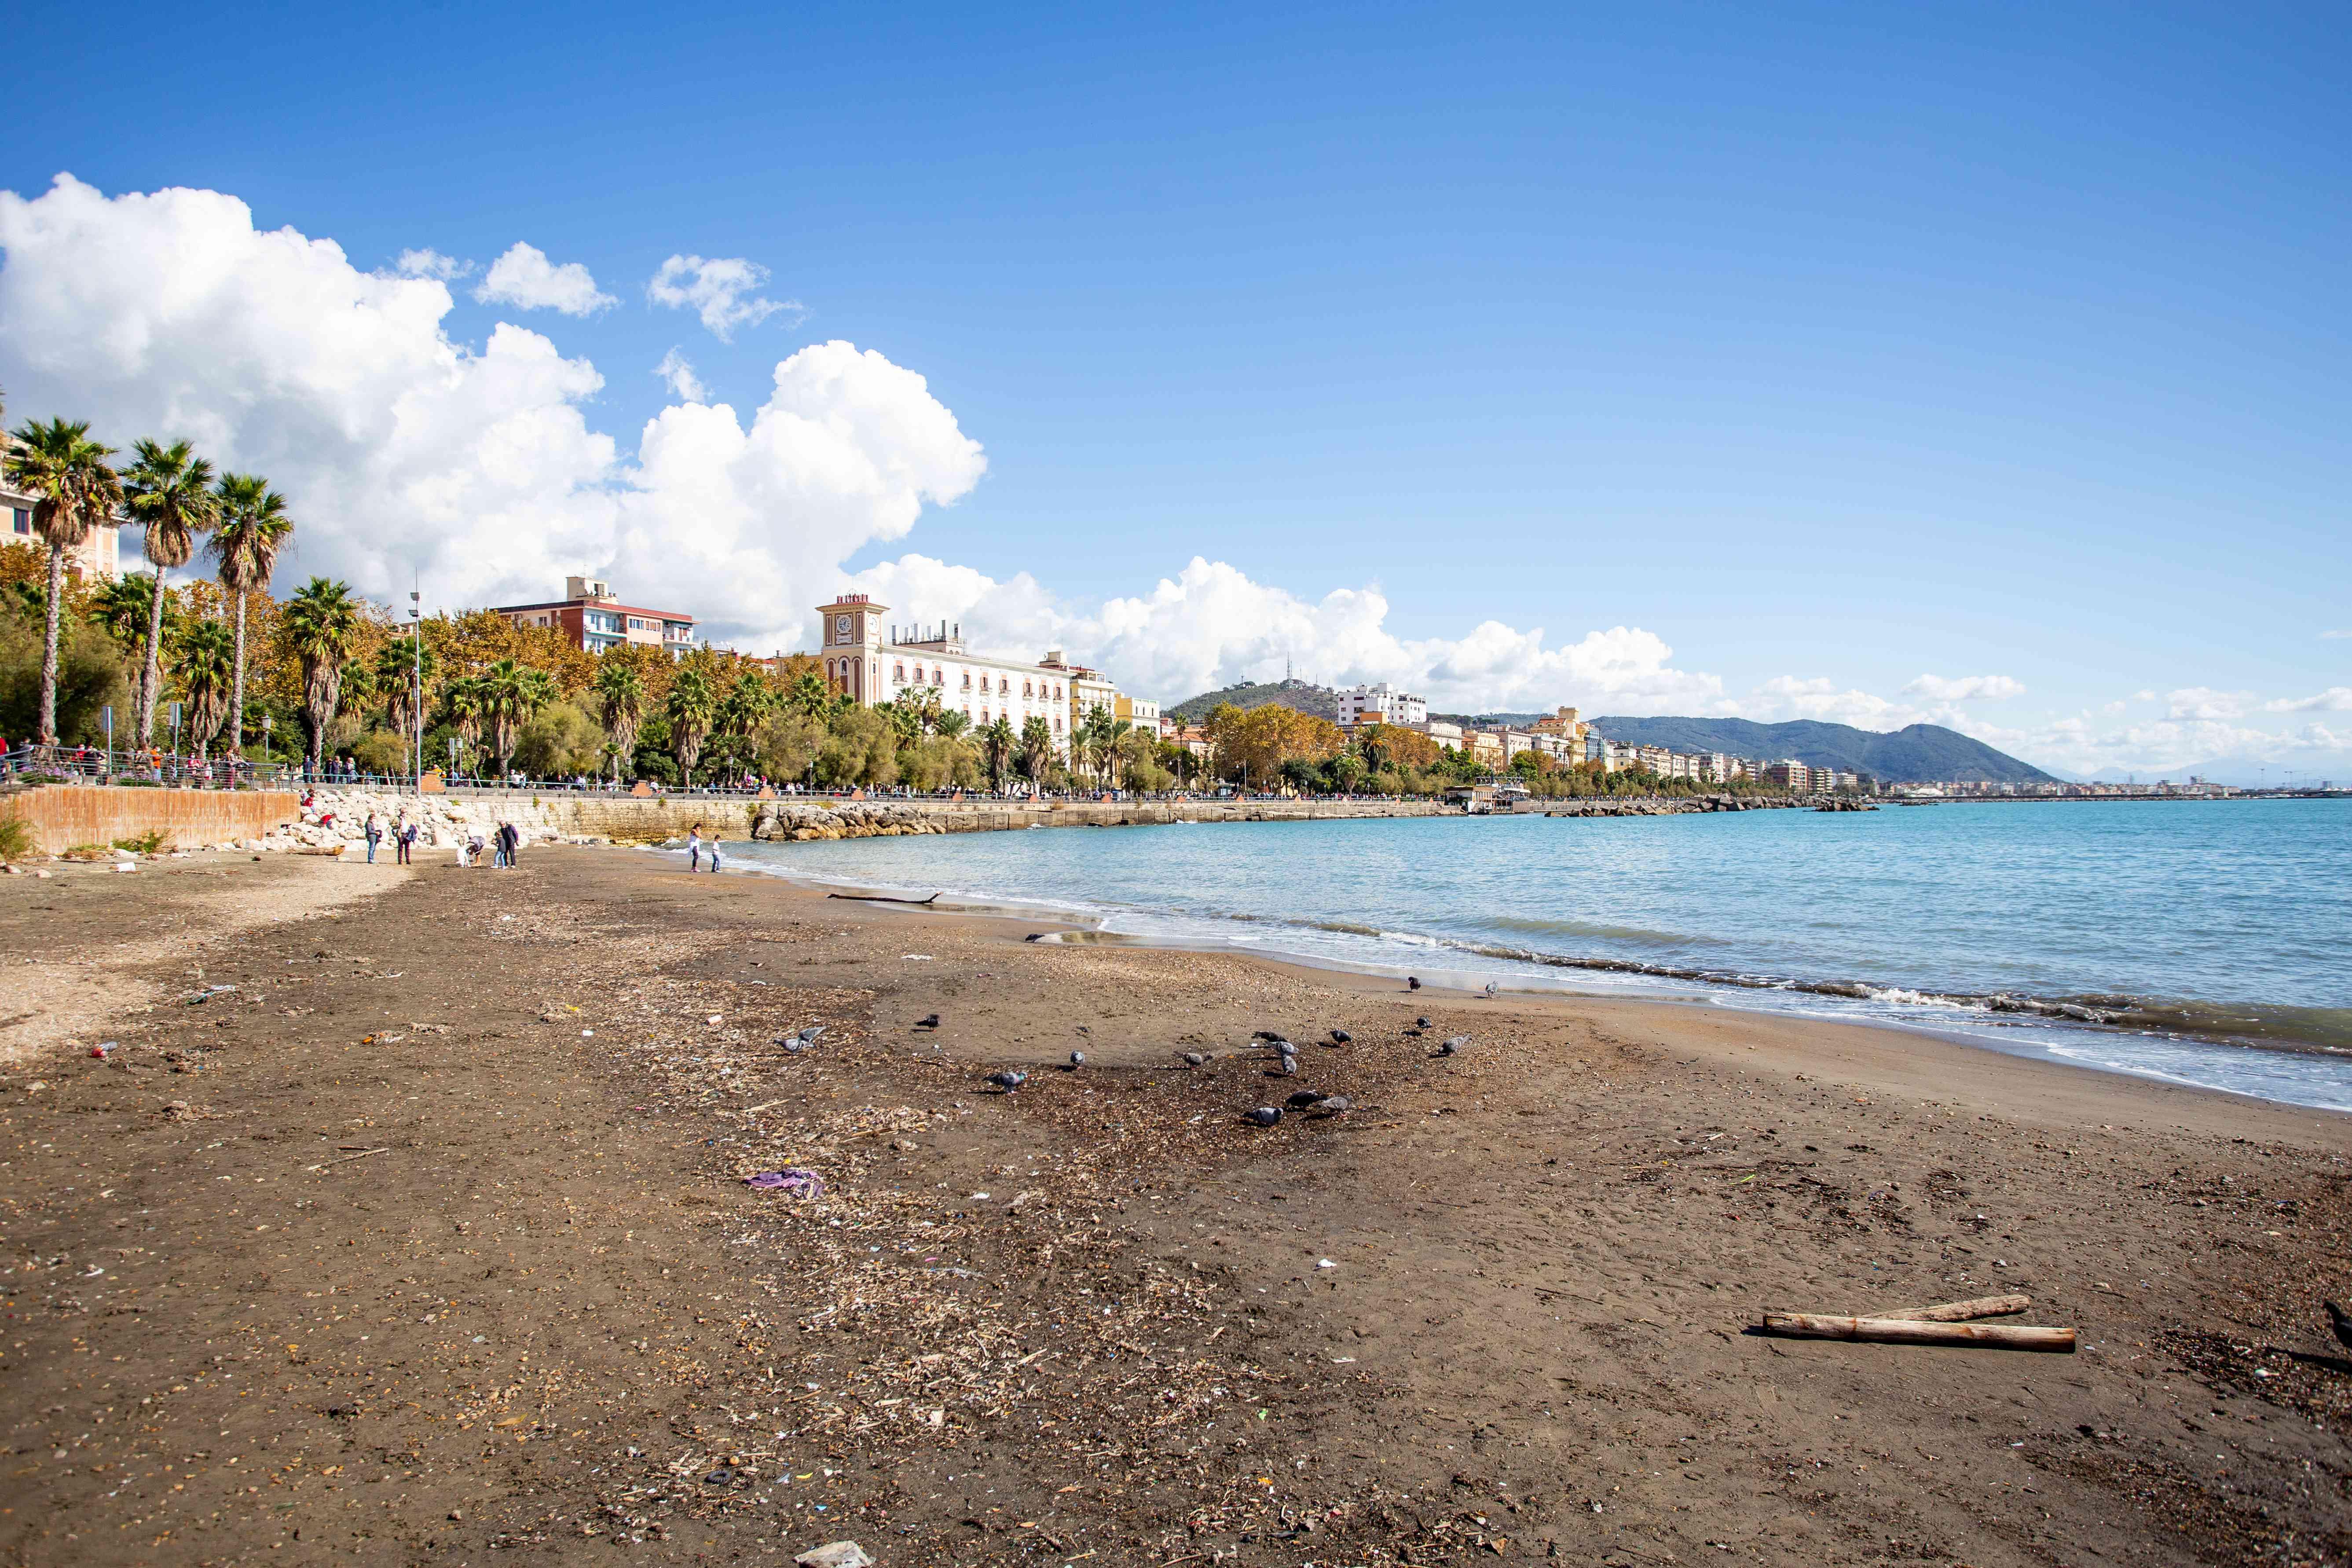 Scenic Beach near Salerno, Italy